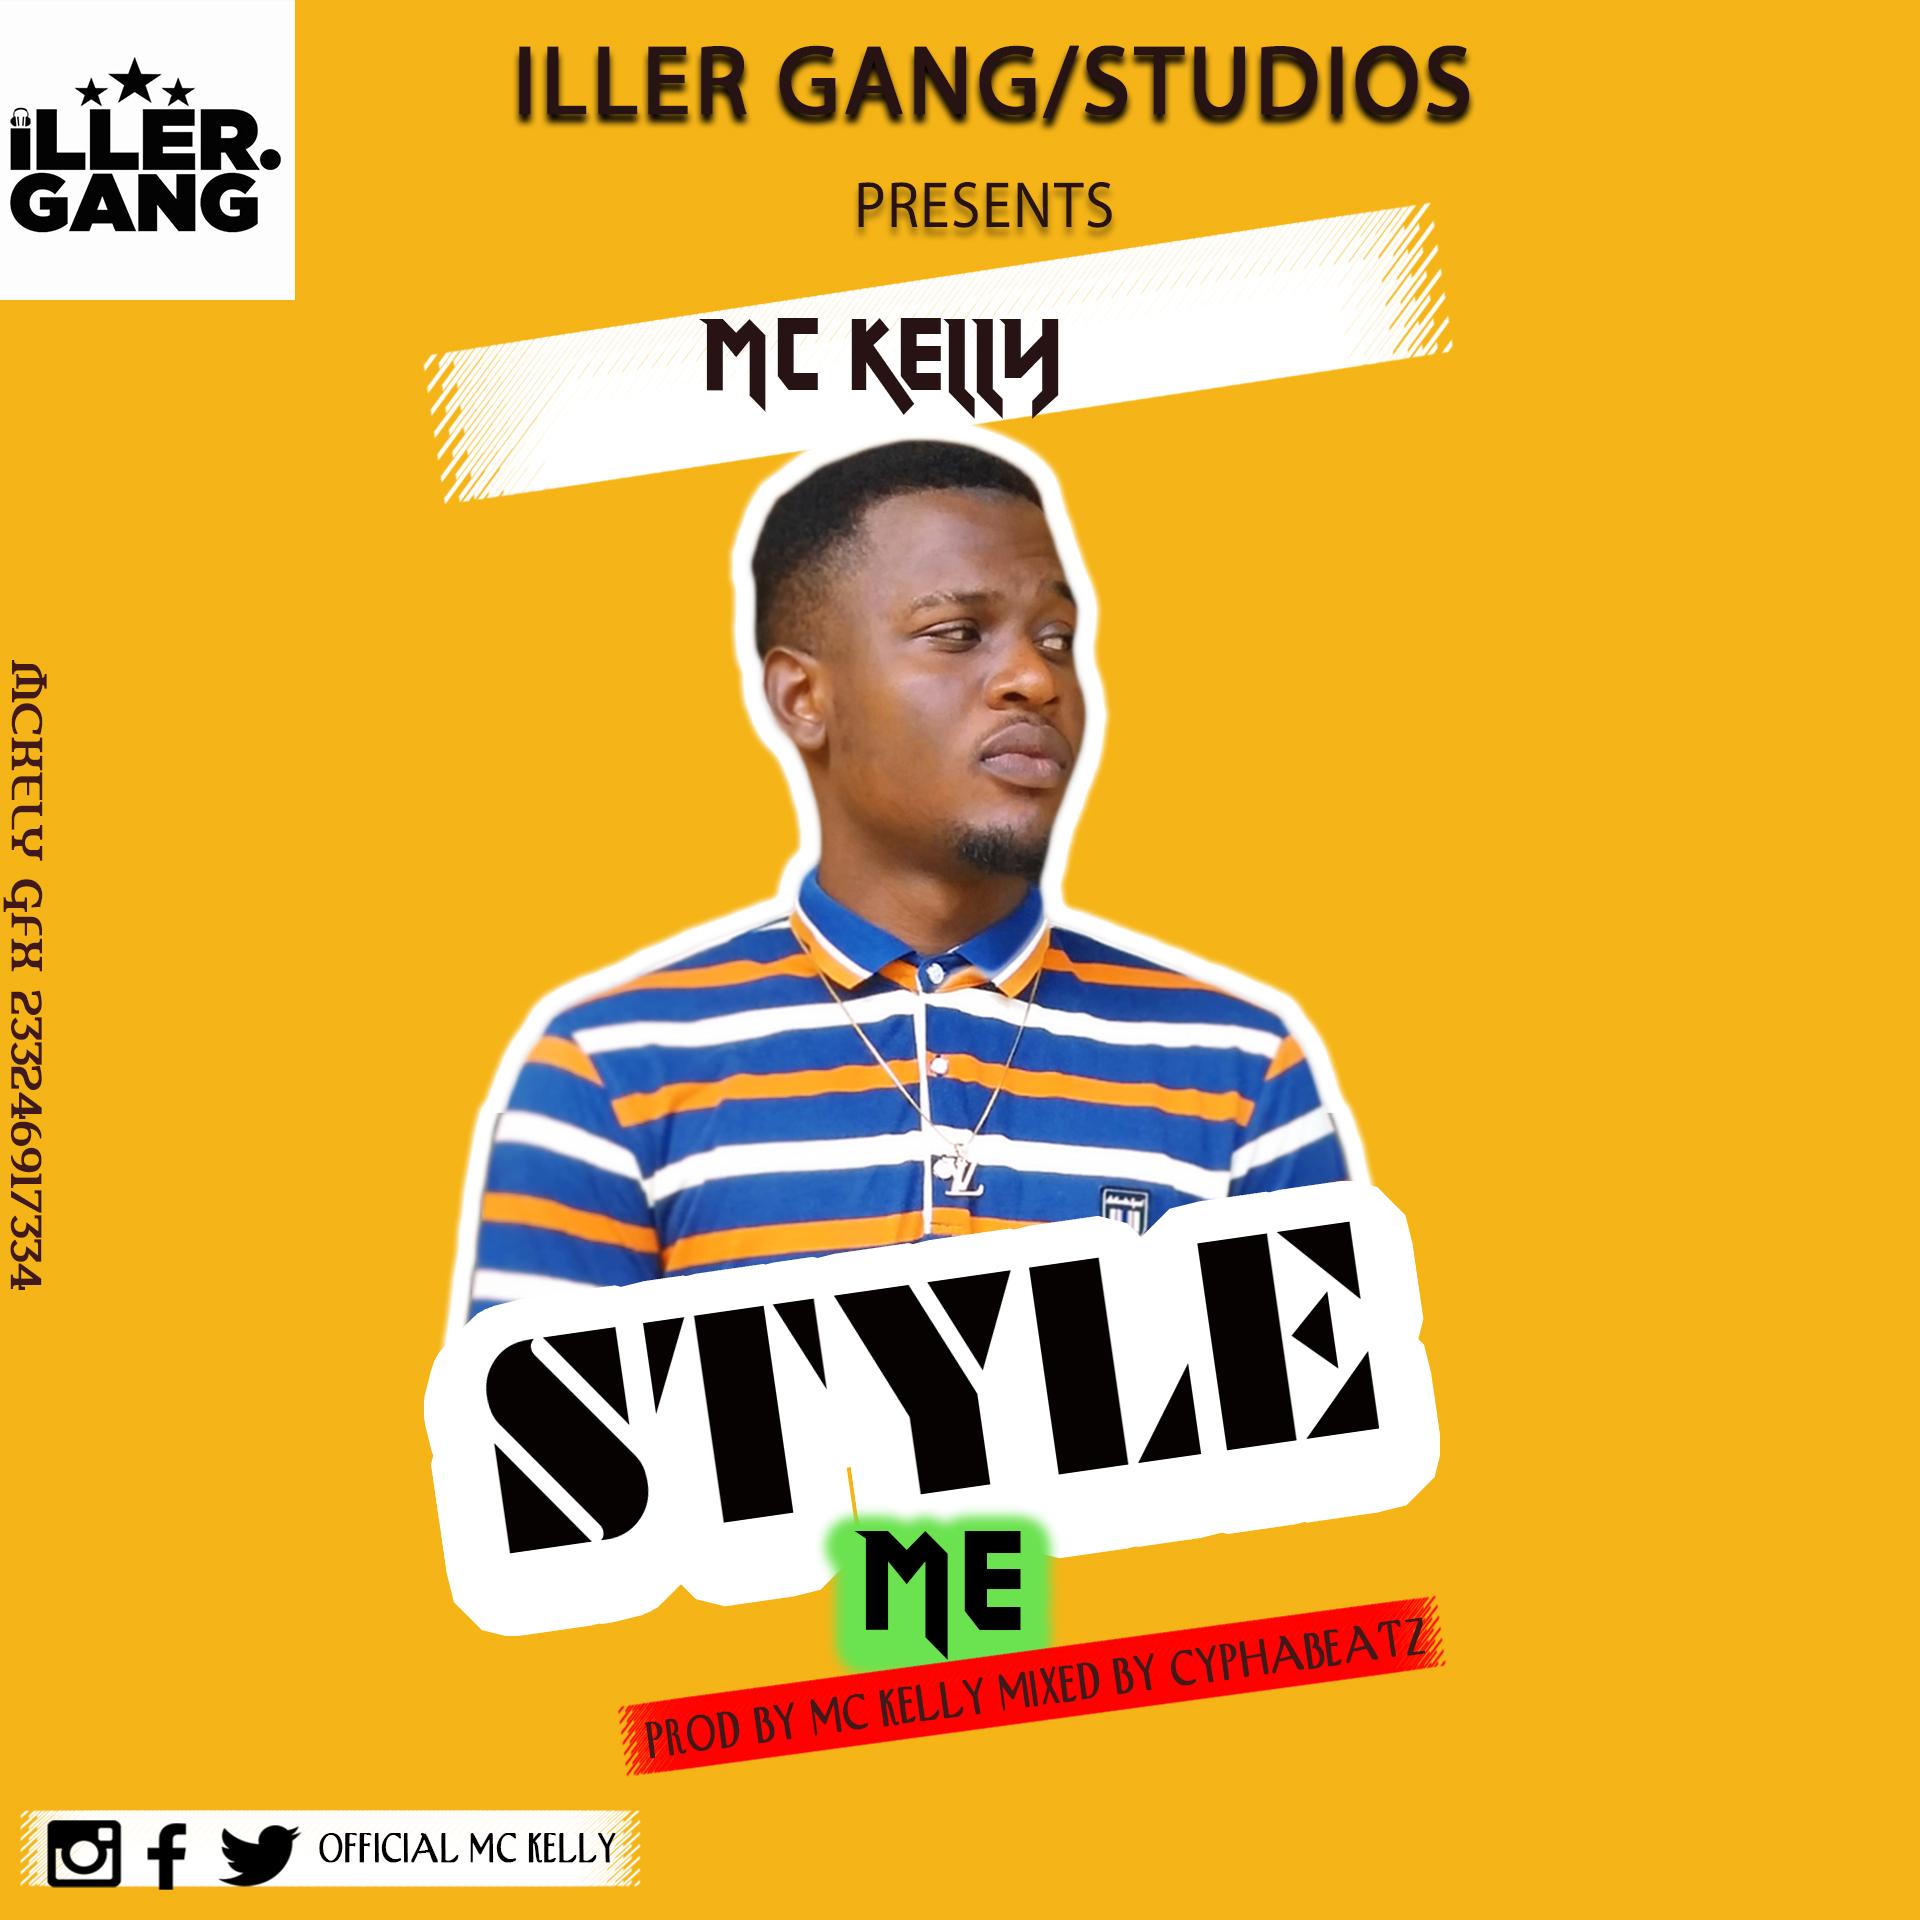 Photo of Mc Kelly – Style Me (Prod. By Mc Kelly x Mixed By Cyphabeatz)